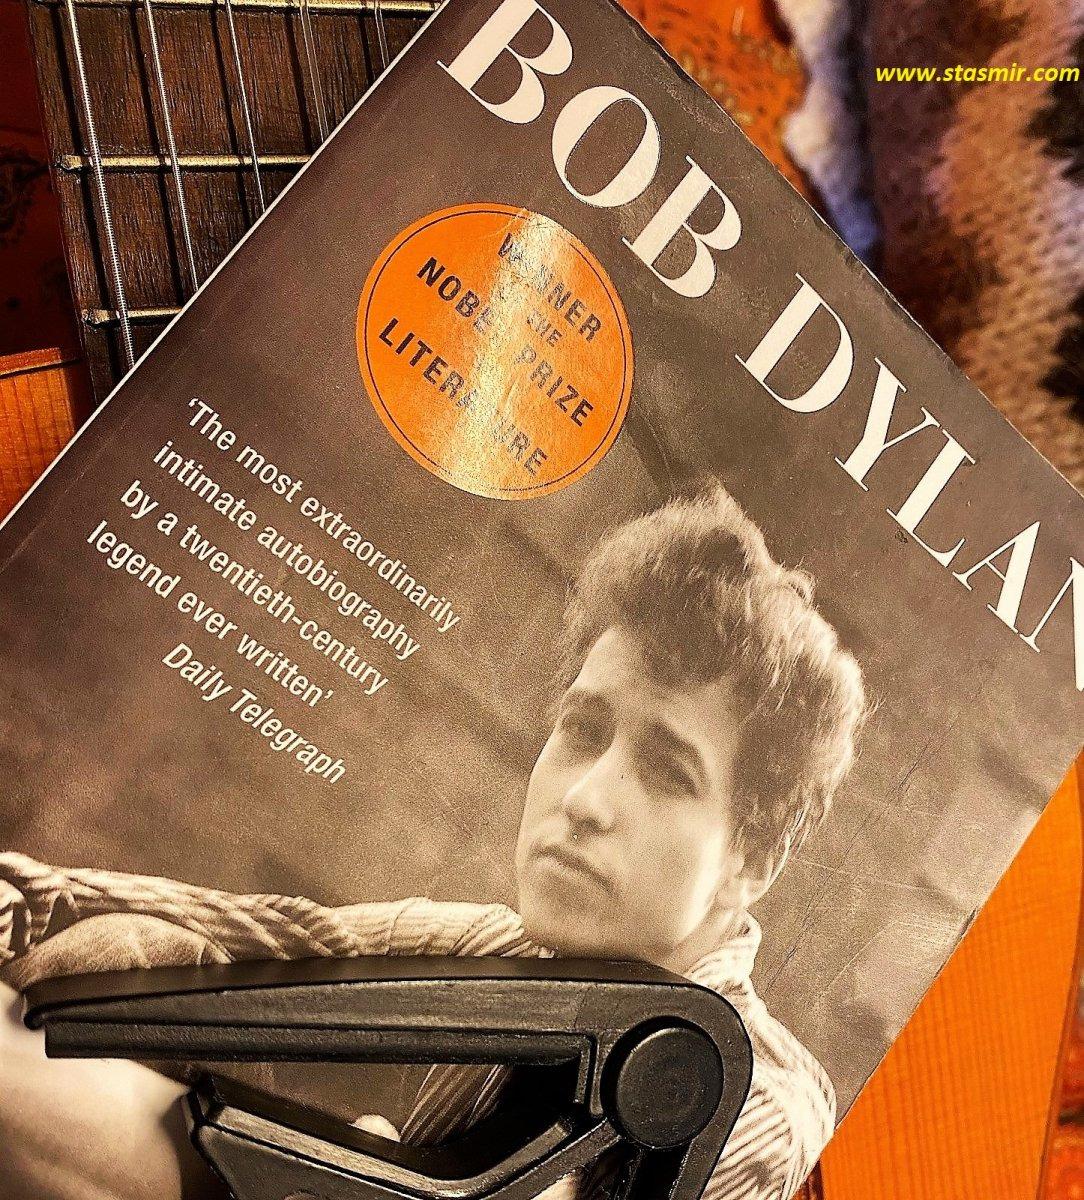 Chronicles and BOB DYLAN, photo Stasmir, Фото Стасмир